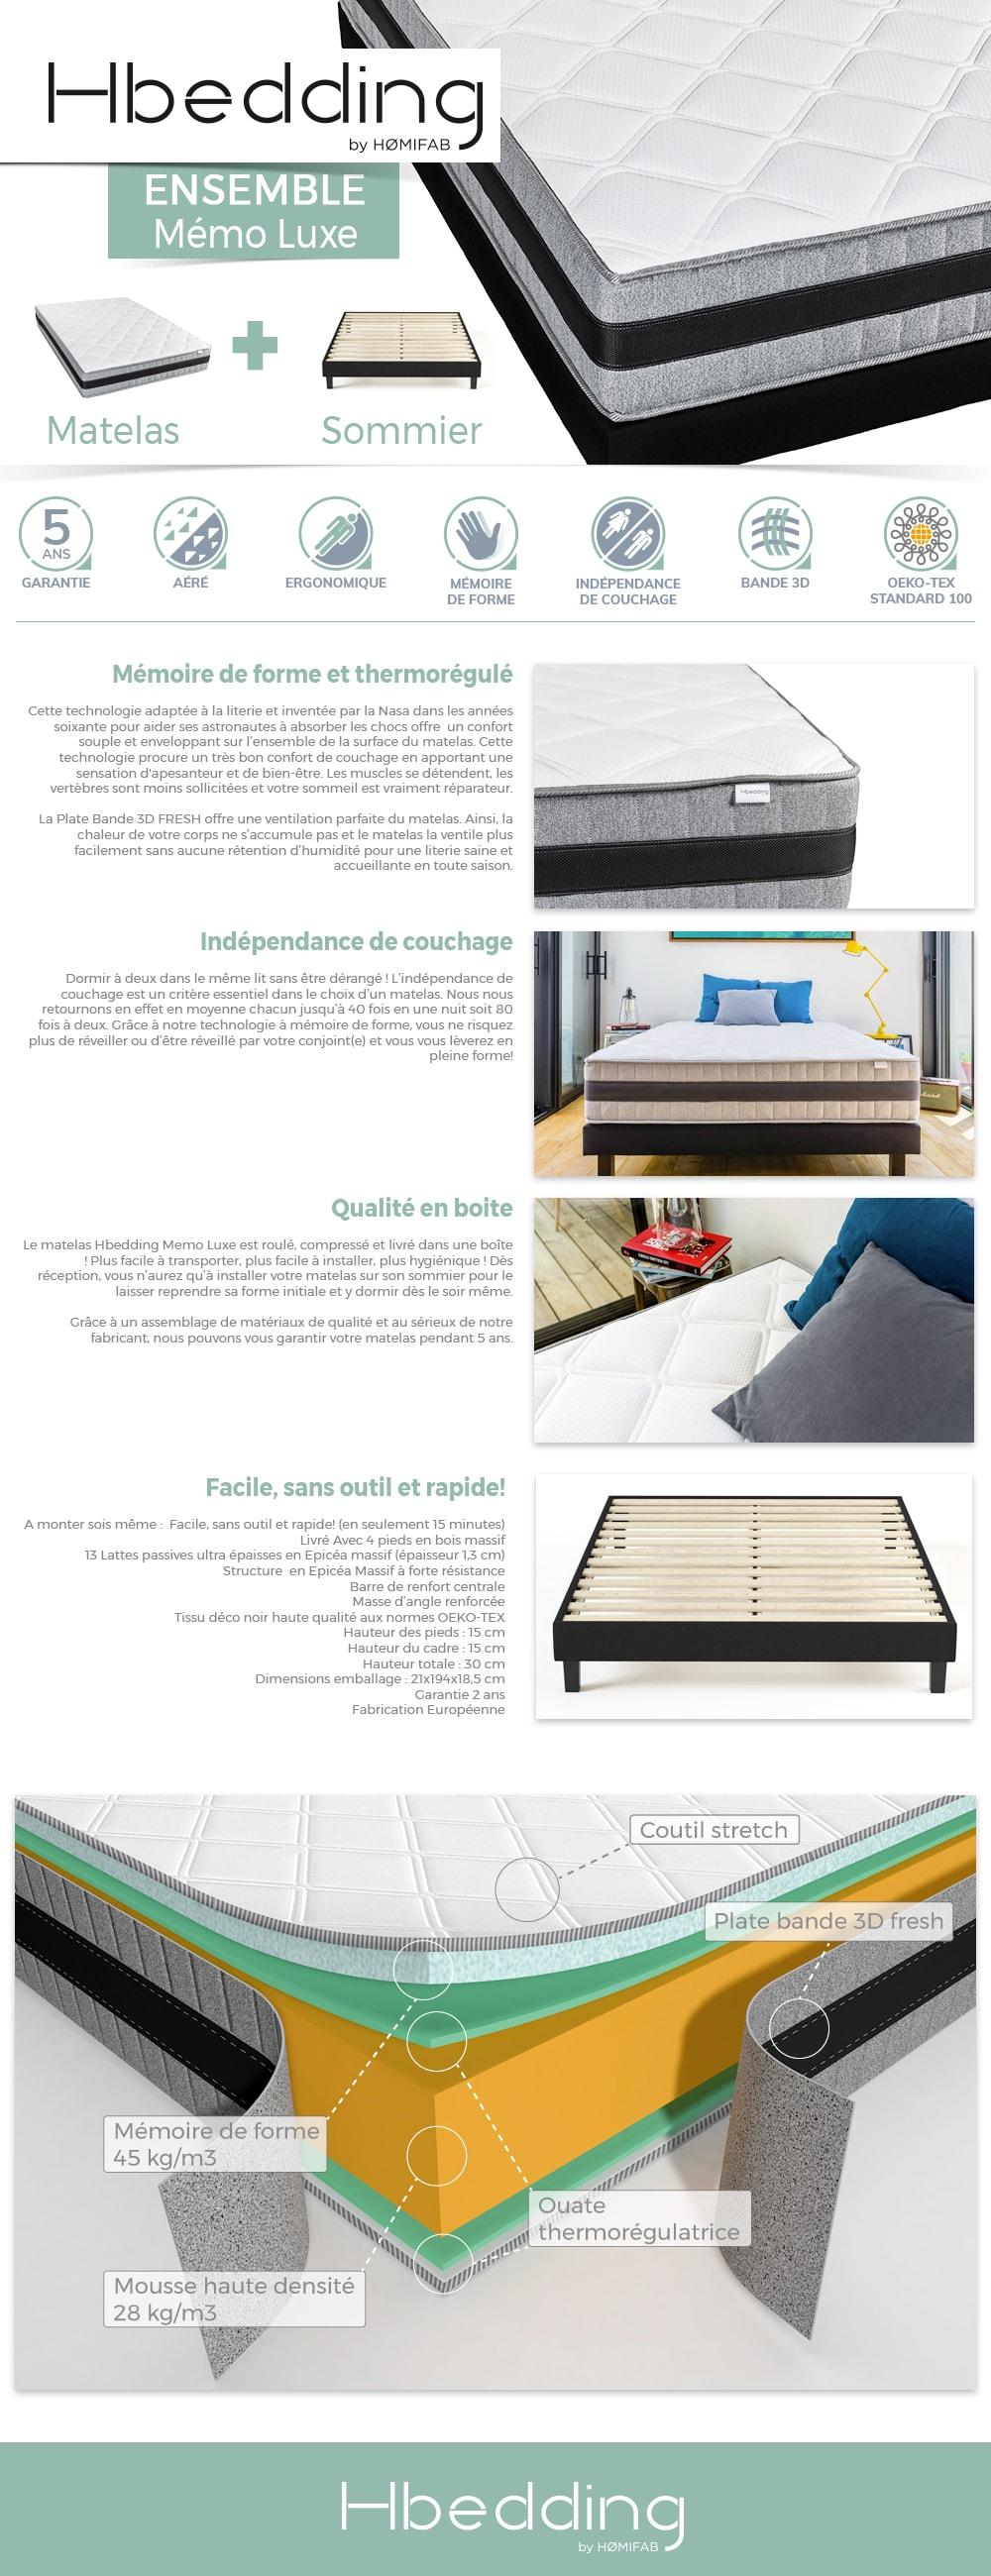 ensemble matelas et sommier hbedding ensemble matelas. Black Bedroom Furniture Sets. Home Design Ideas